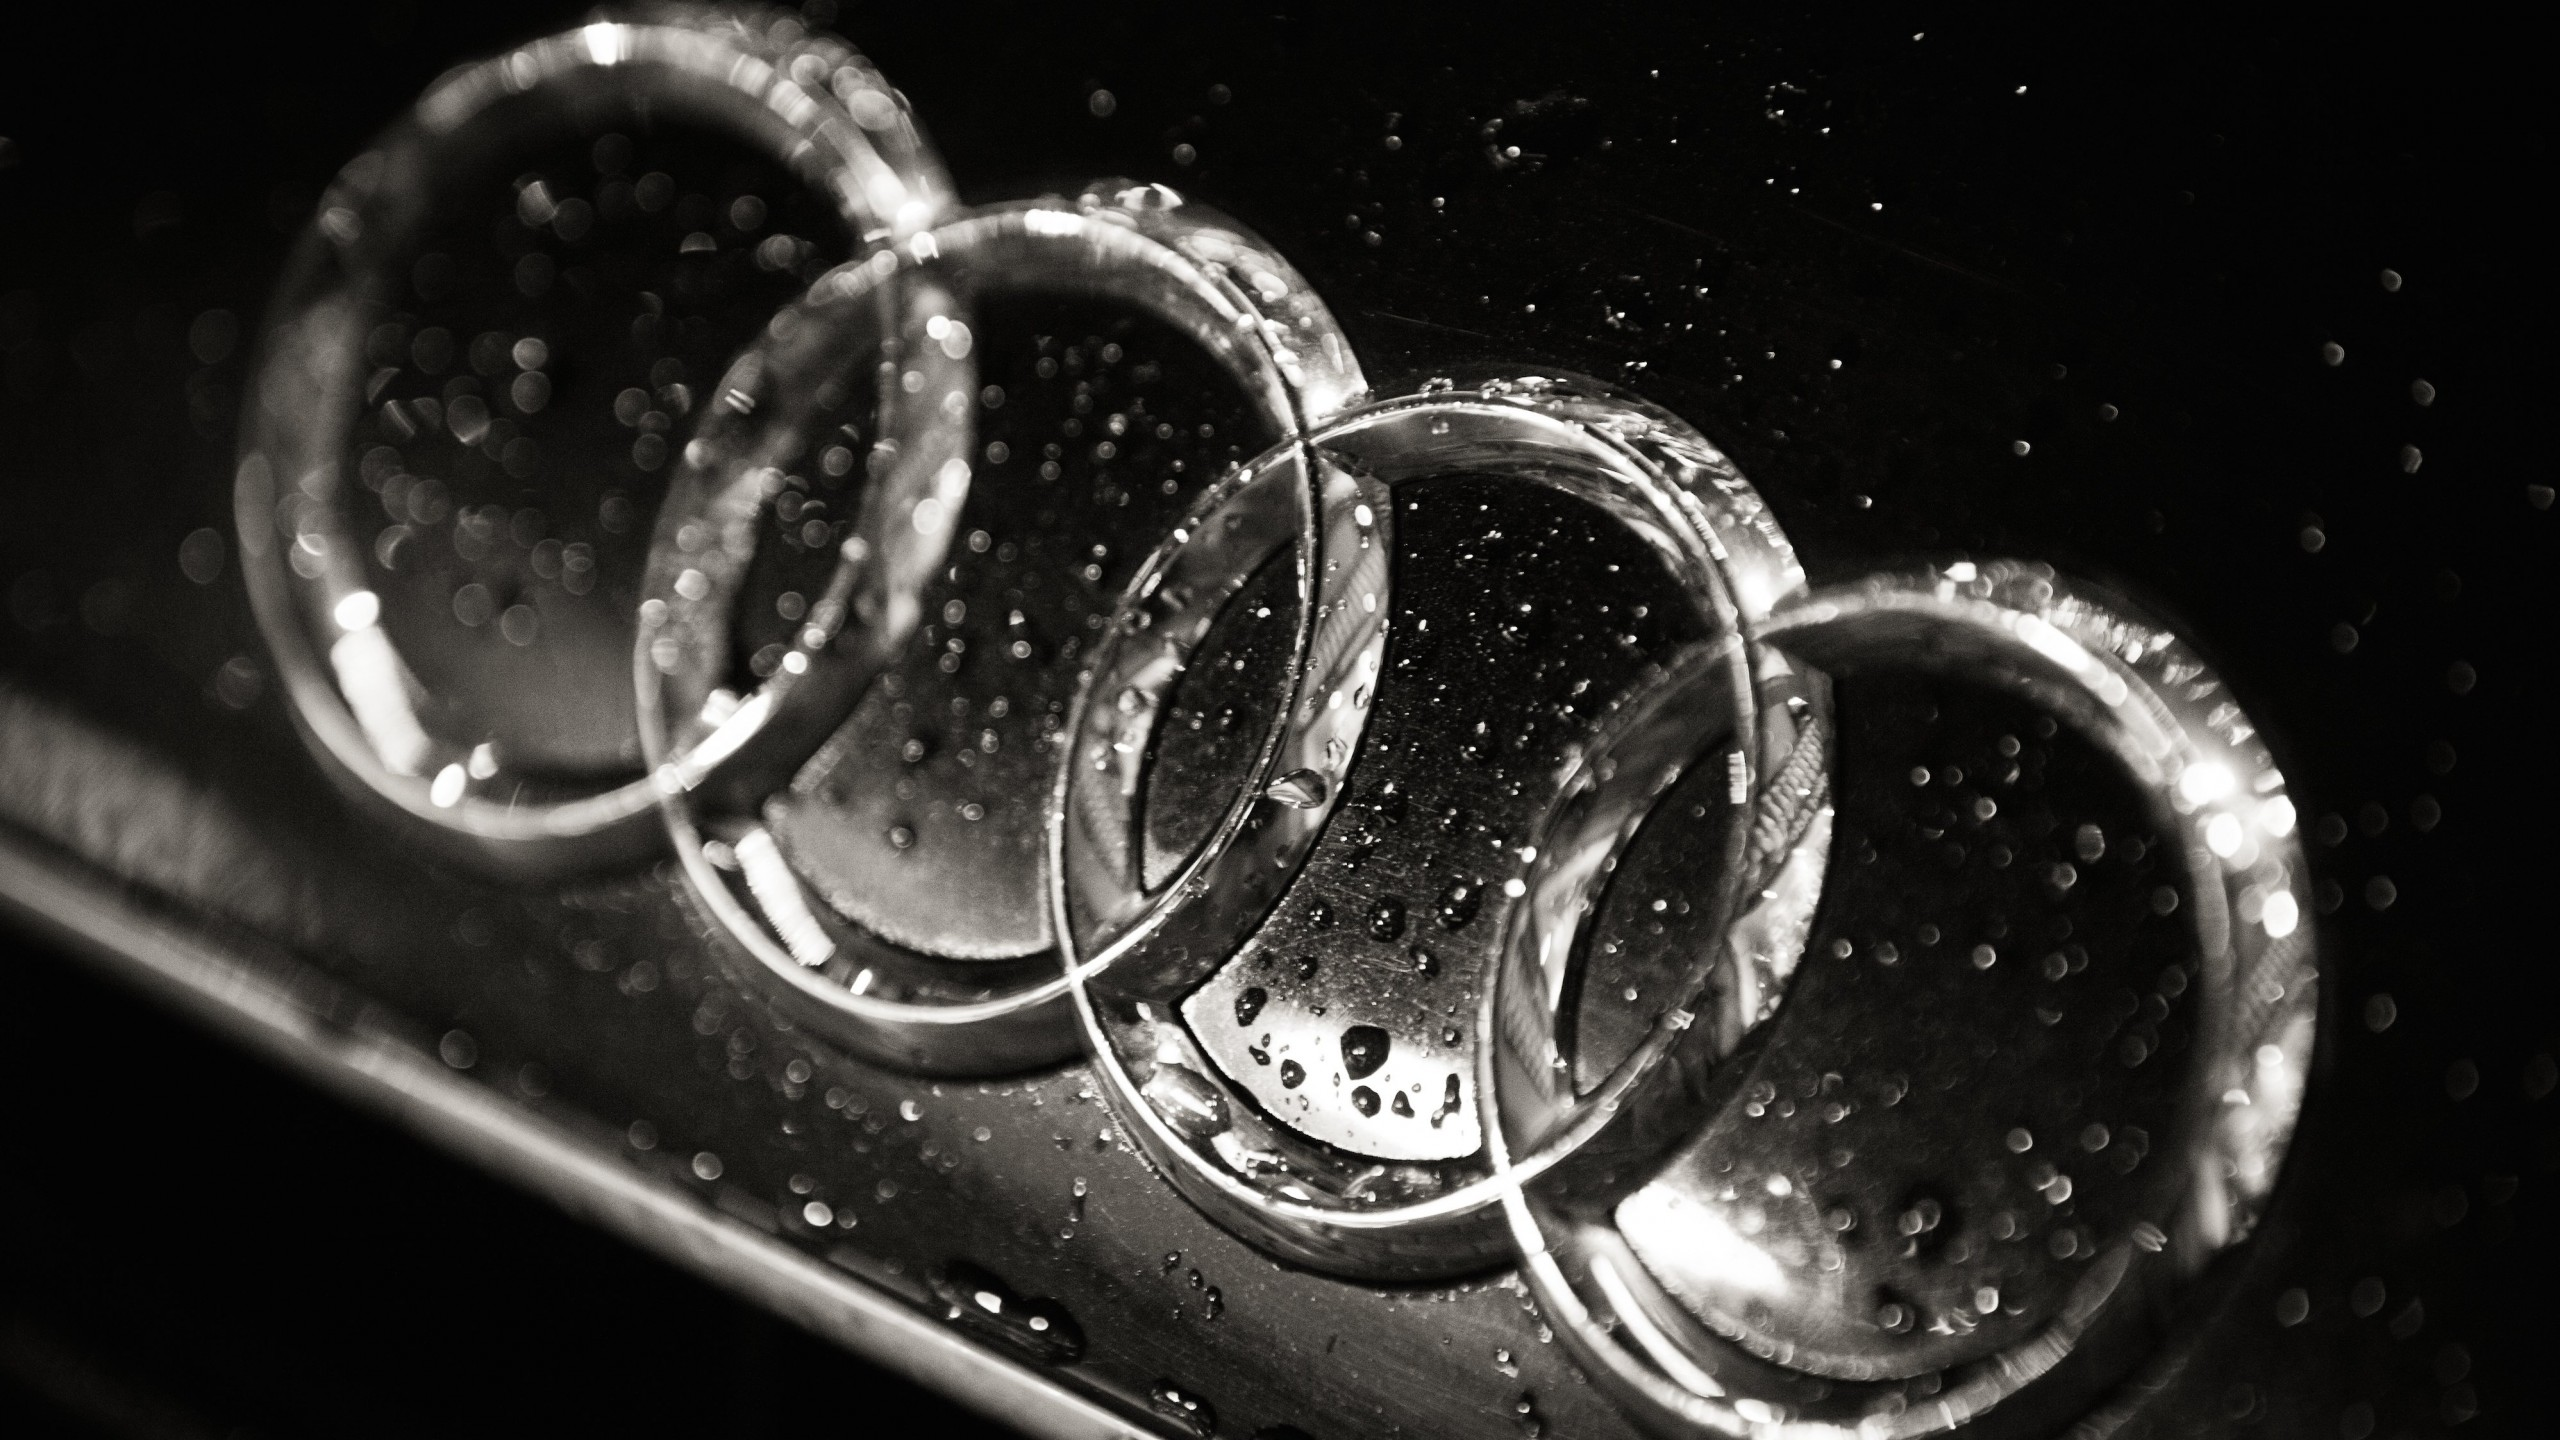 Download Audi Logo in Black & White HD wallpaper for 2560 x 1440 - HDwallpapers.net